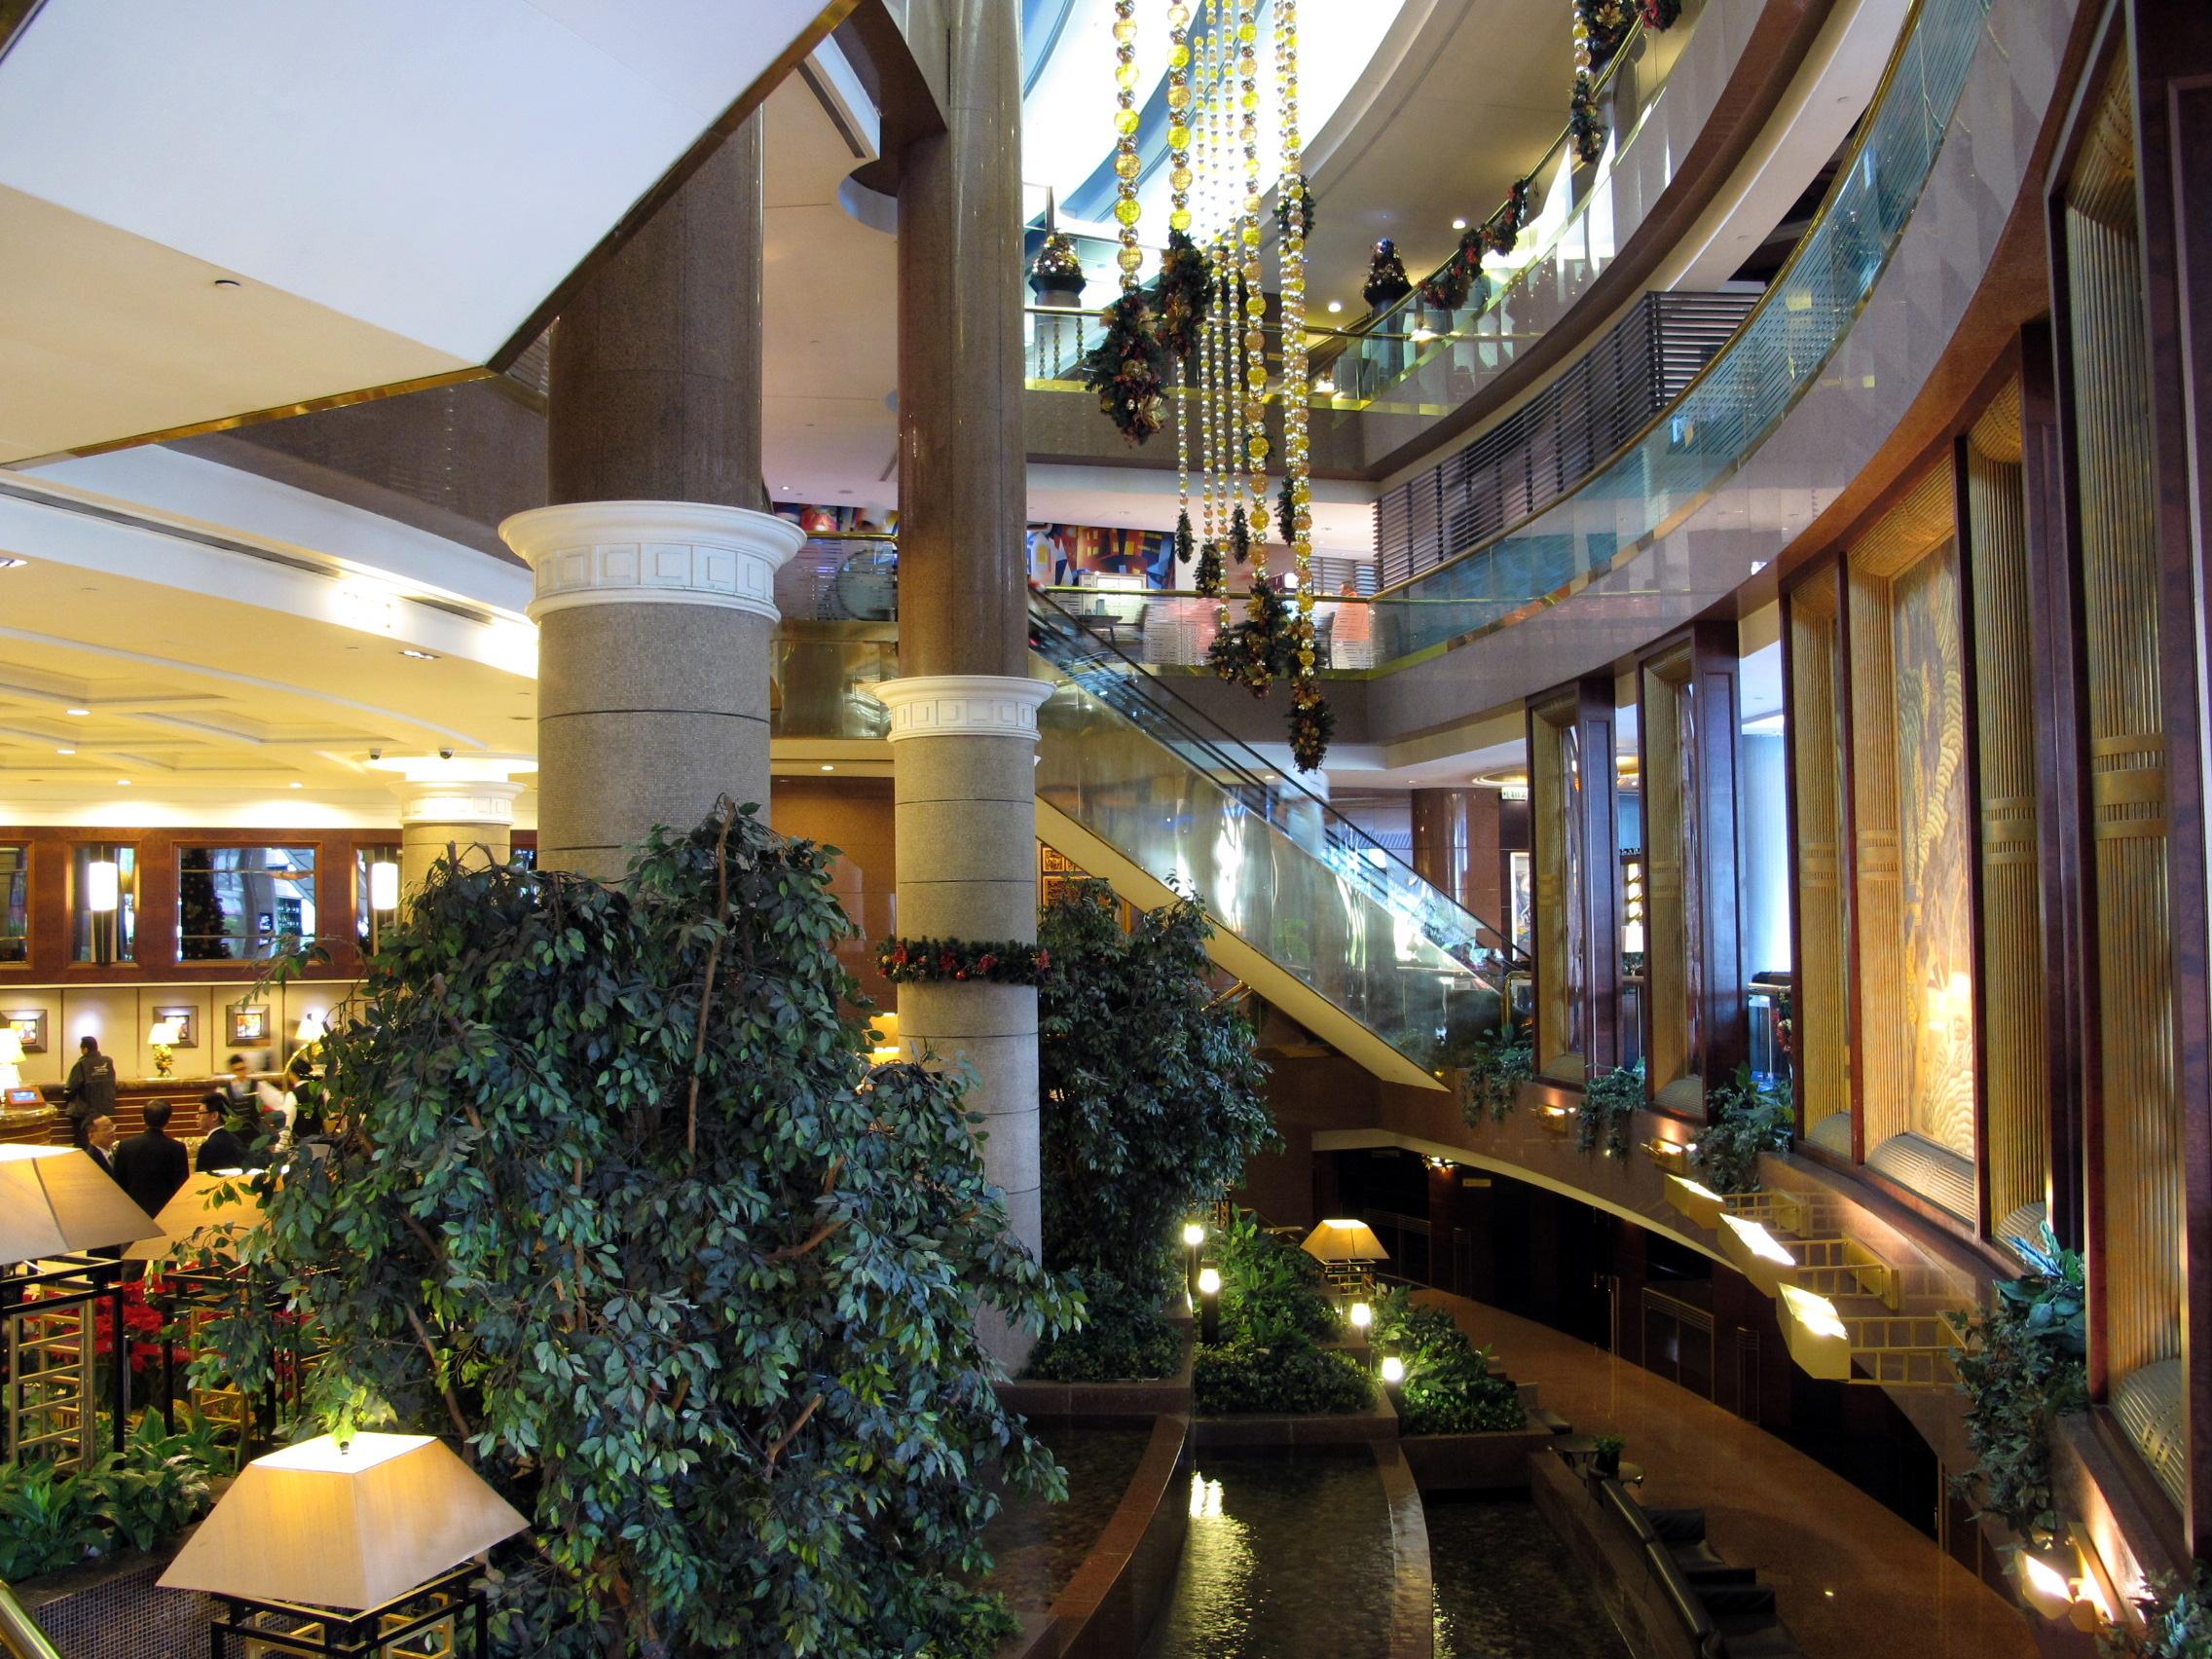 File:New World Millennium Hong Kong Hotel Lobby 201212.jpg - 维基百科,自由的百科全书